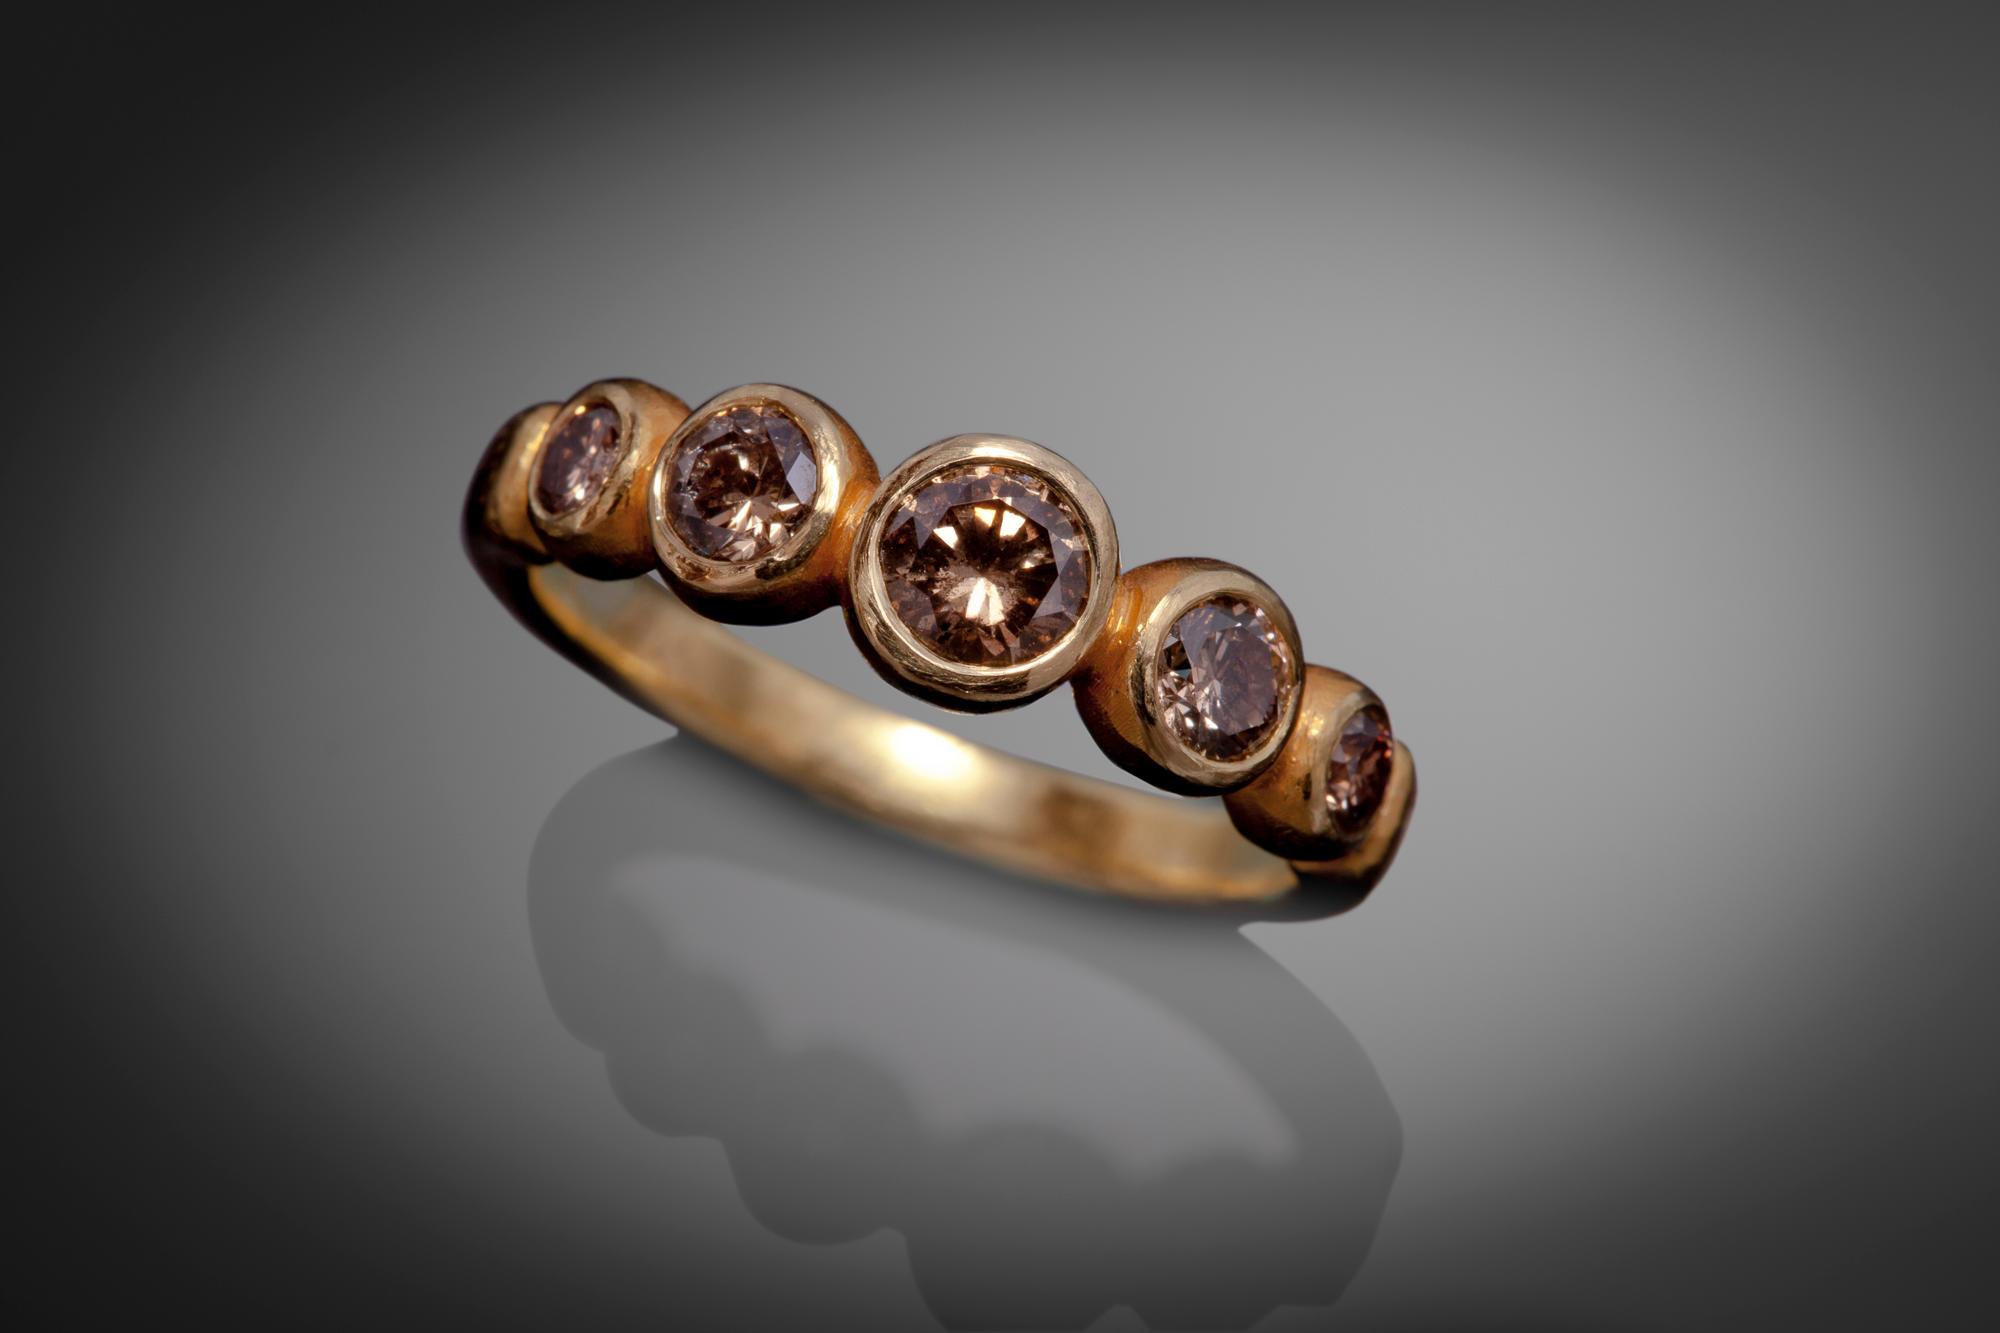 Ormachea Jewelry image 8